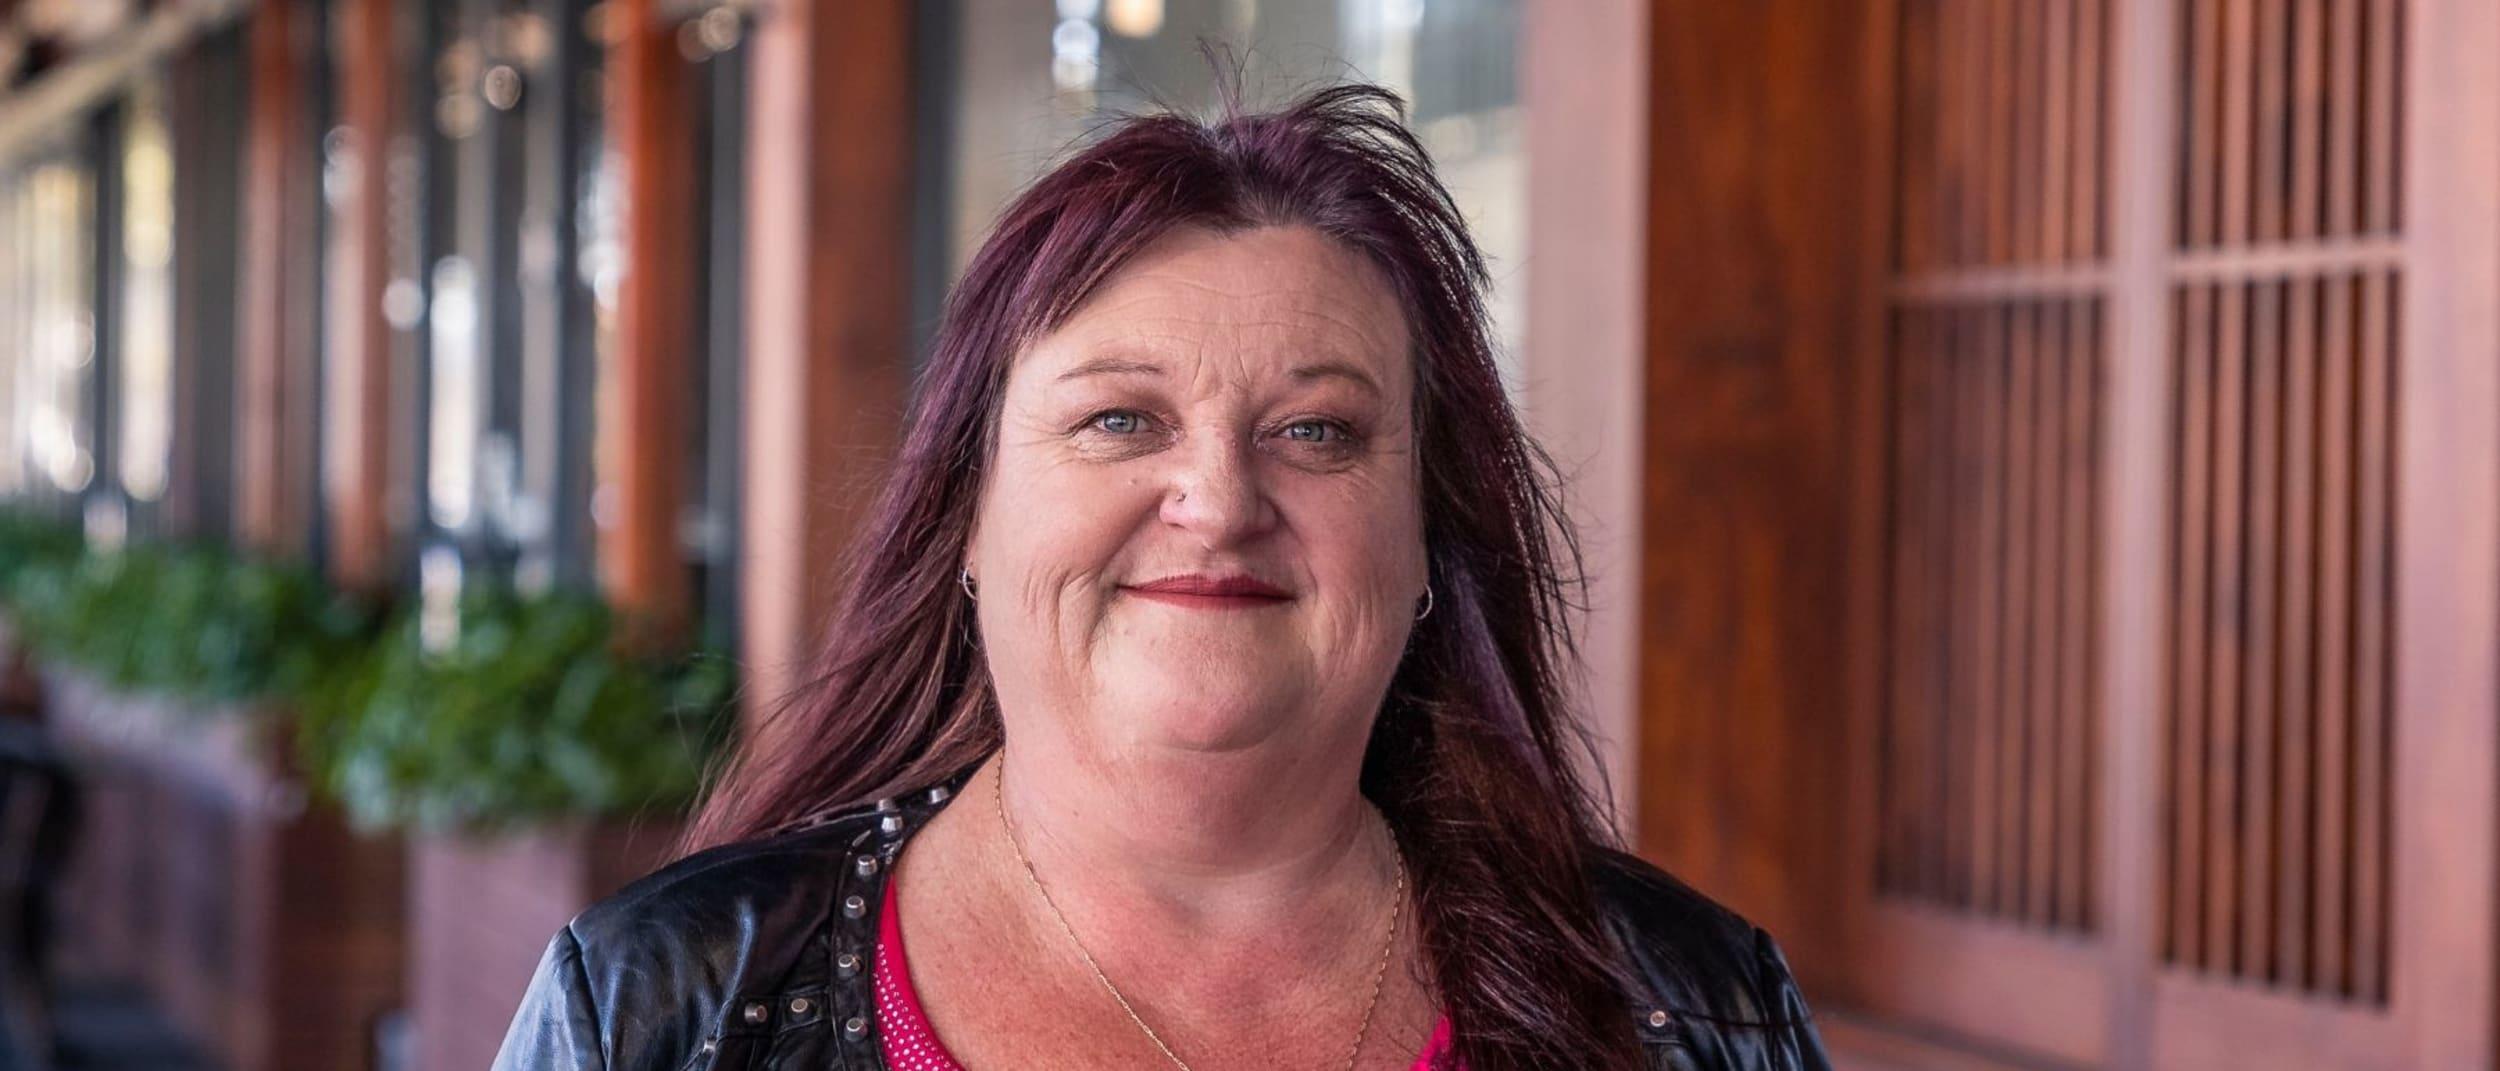 Natalie Malcolmson: BPD Awareness: Westfield Local Heroes 2019